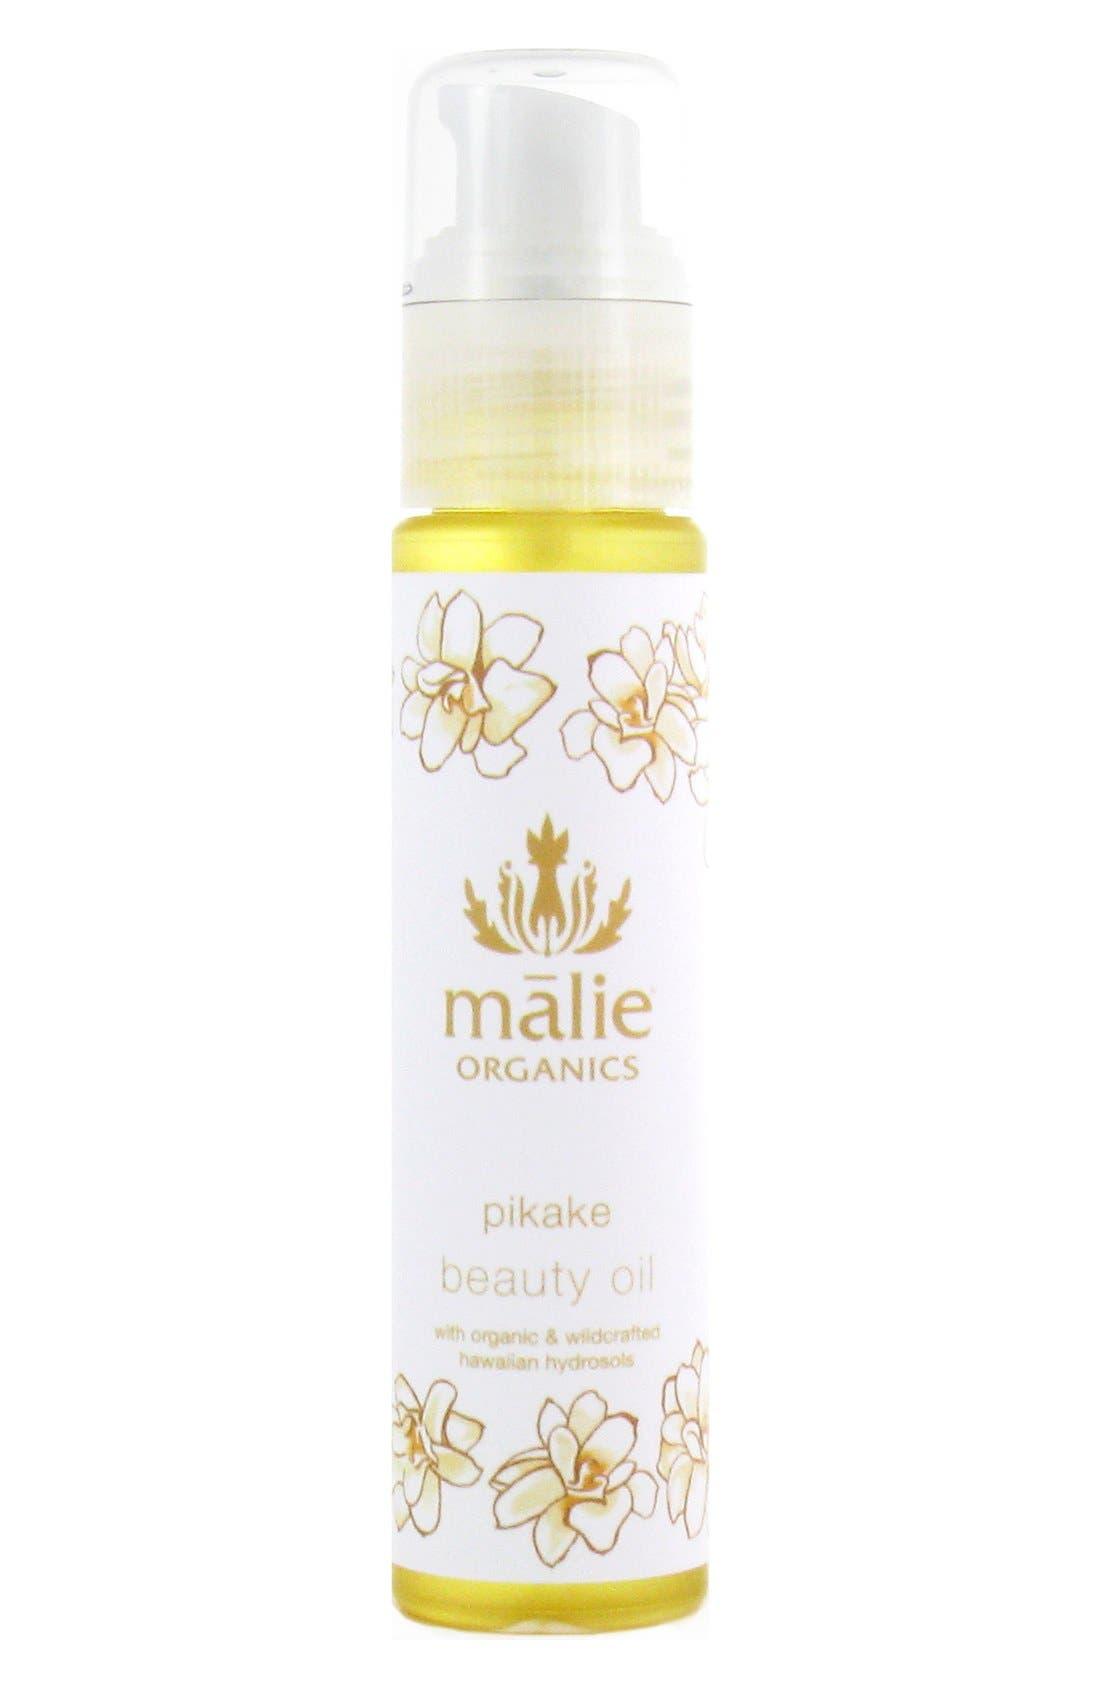 Malie Organics Pikake Beauty Oil